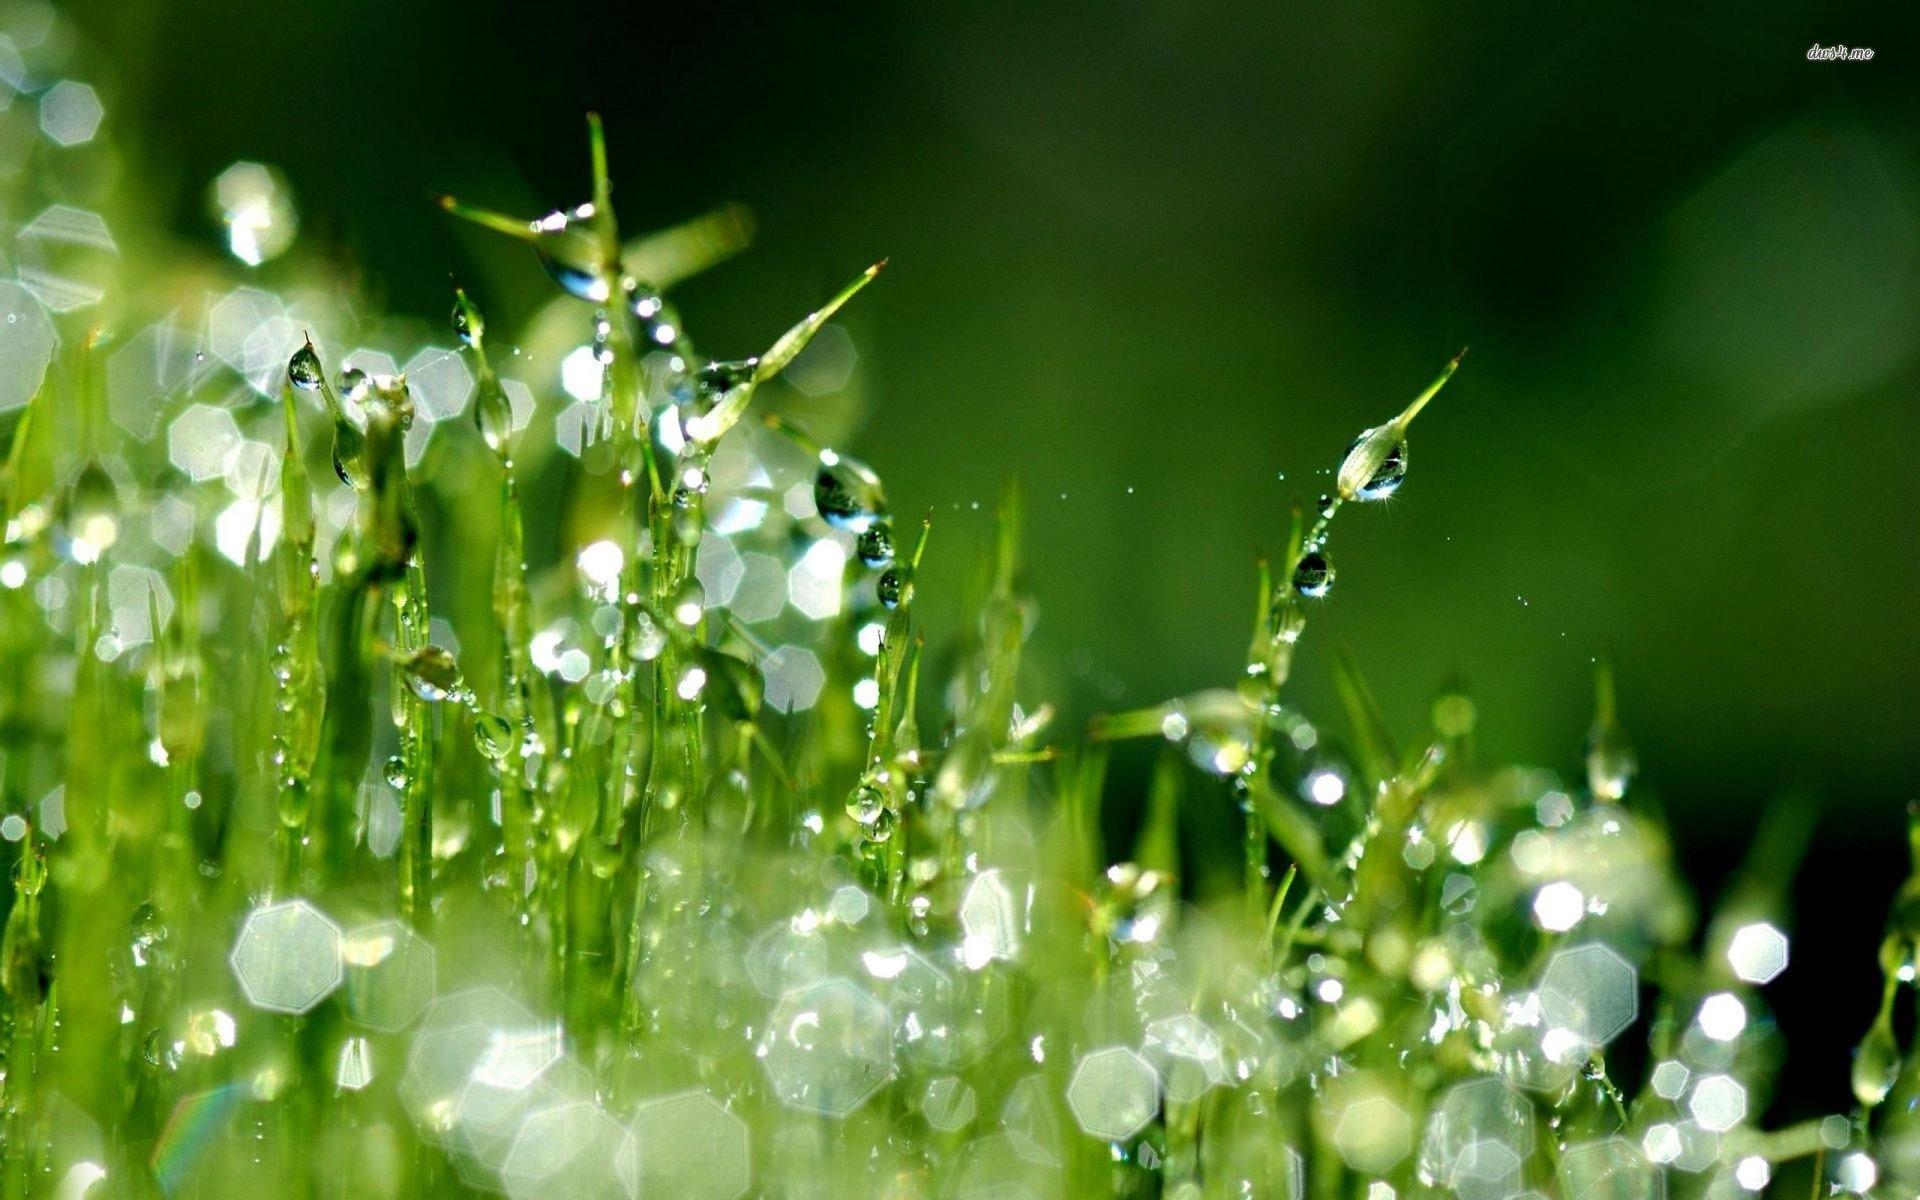 Free photo: Raindrops on grass - Close, Close-up, Closeup - Free ...